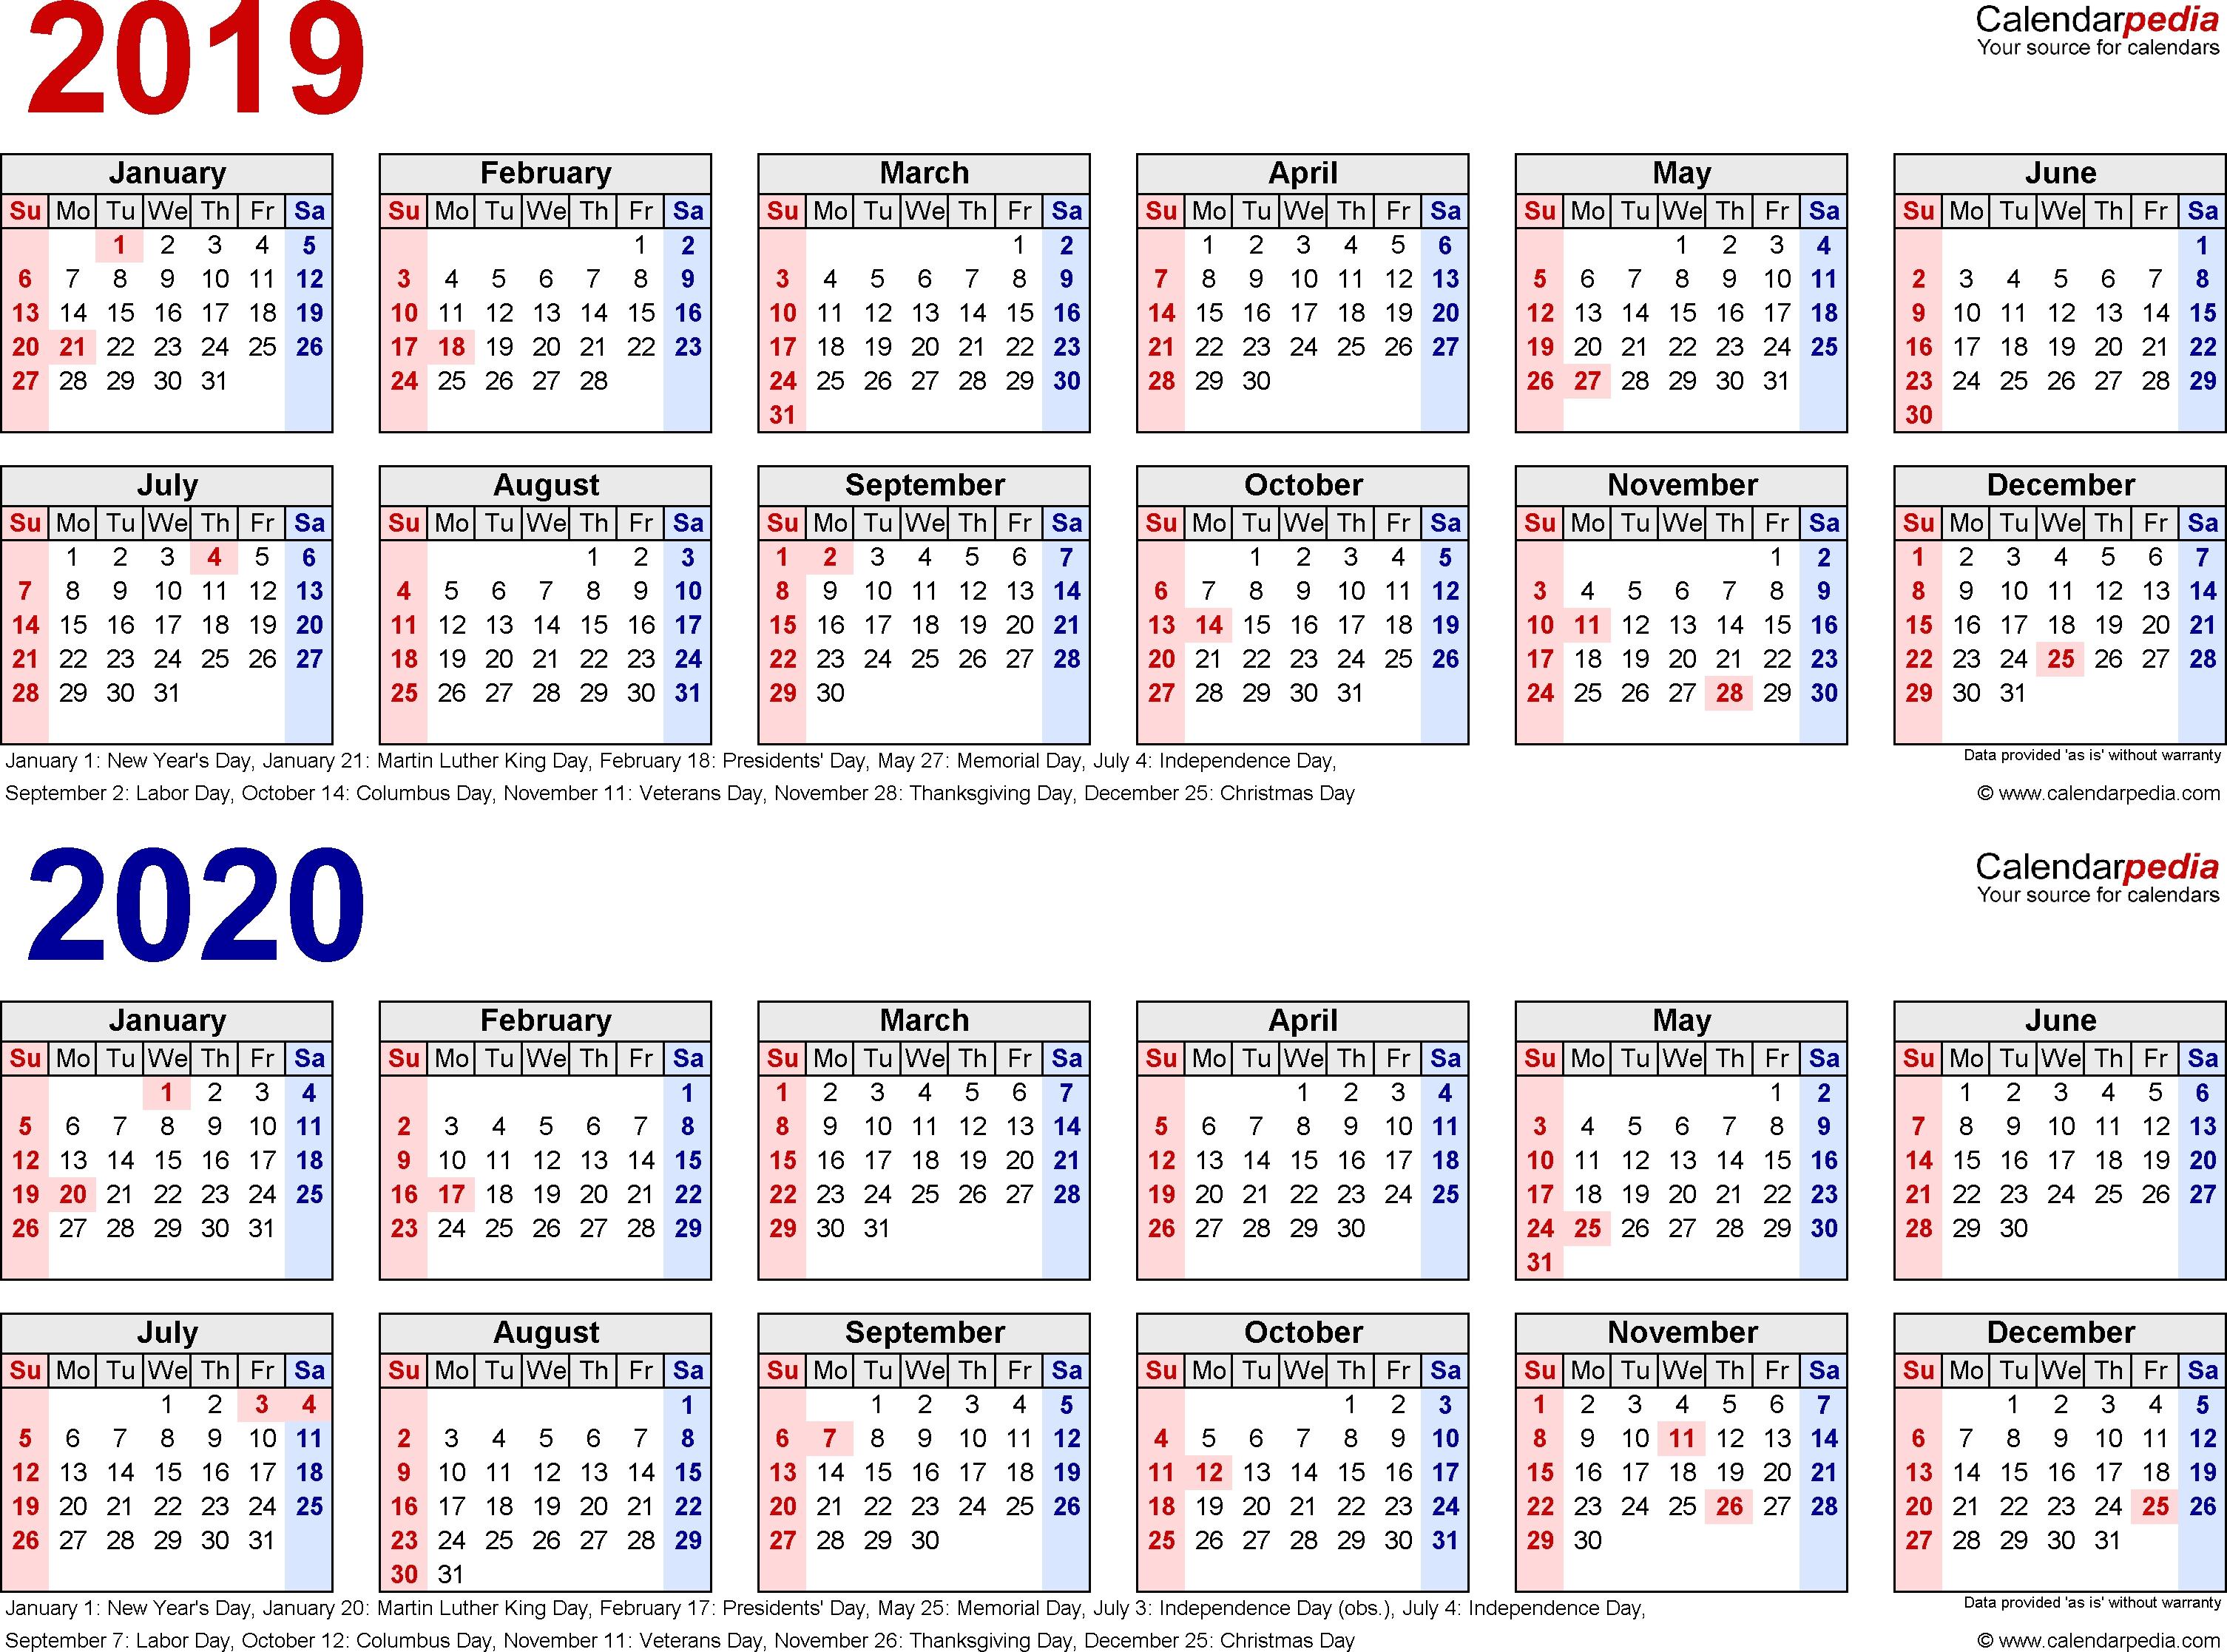 2019-2020 Calendar - Free Printable Two-Year Word Calendars regarding 2019-2020 Word Printable Calendar